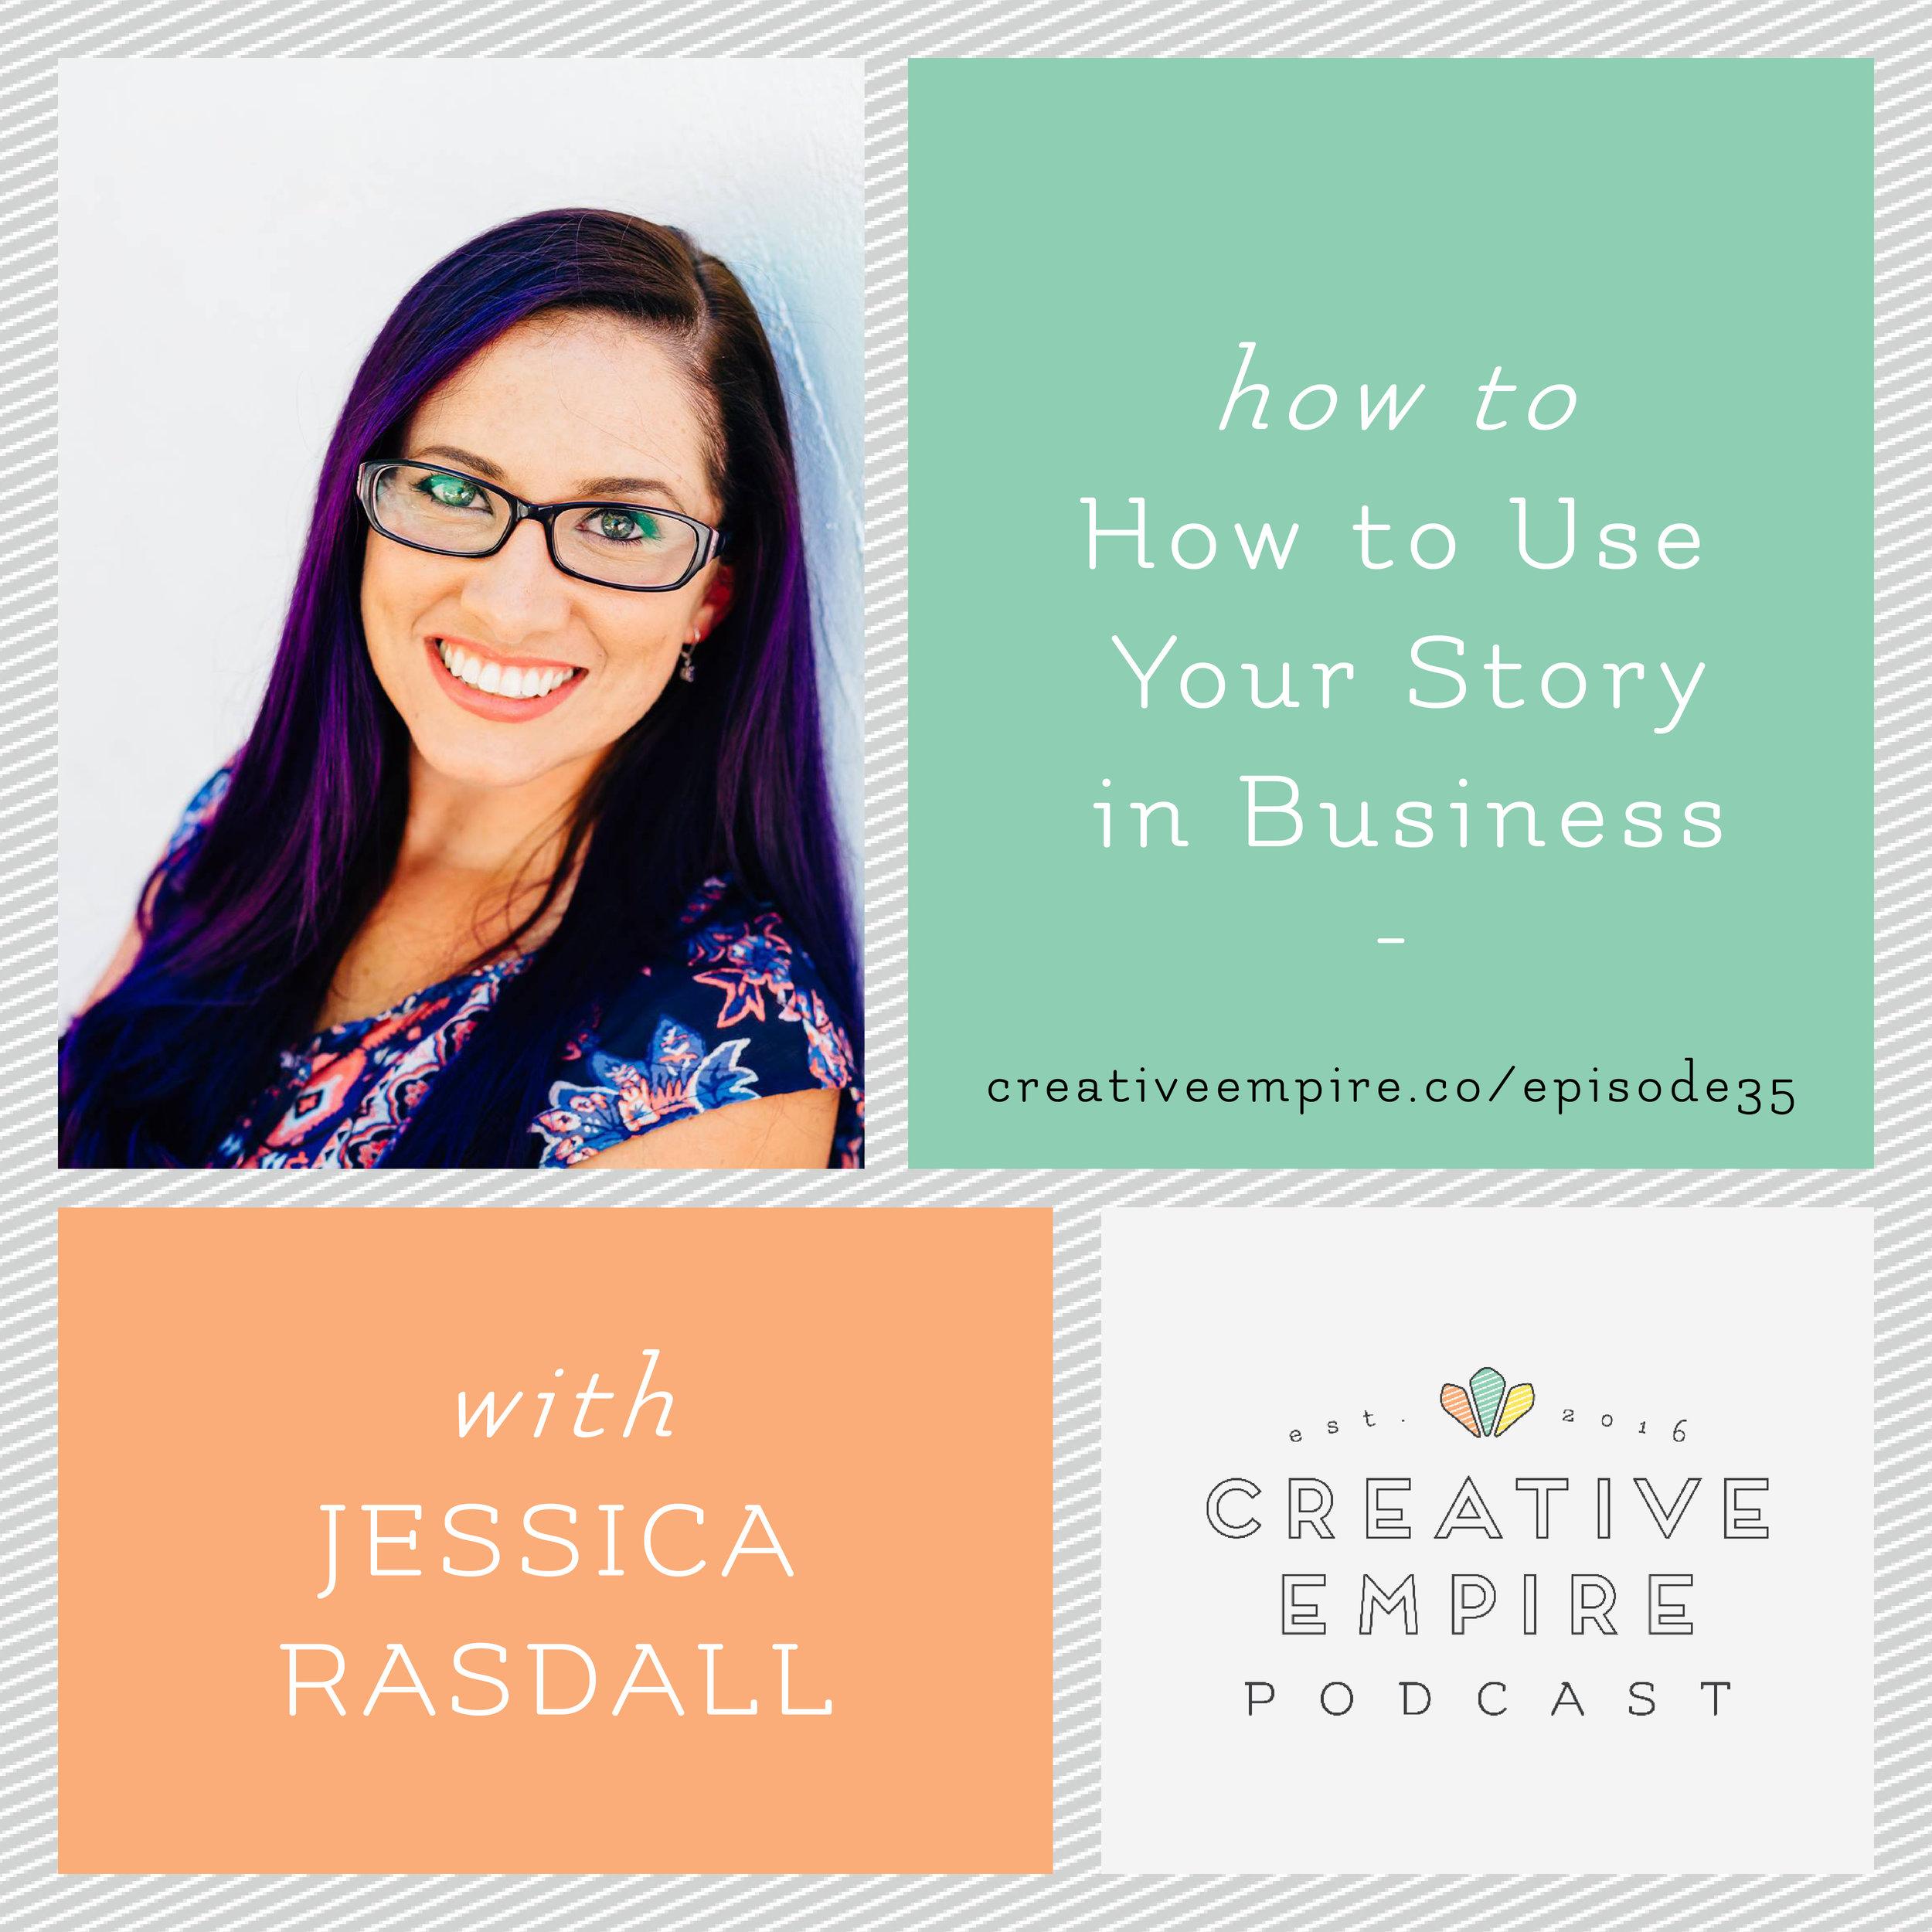 Jessica Rasdall on the creative empire podcast